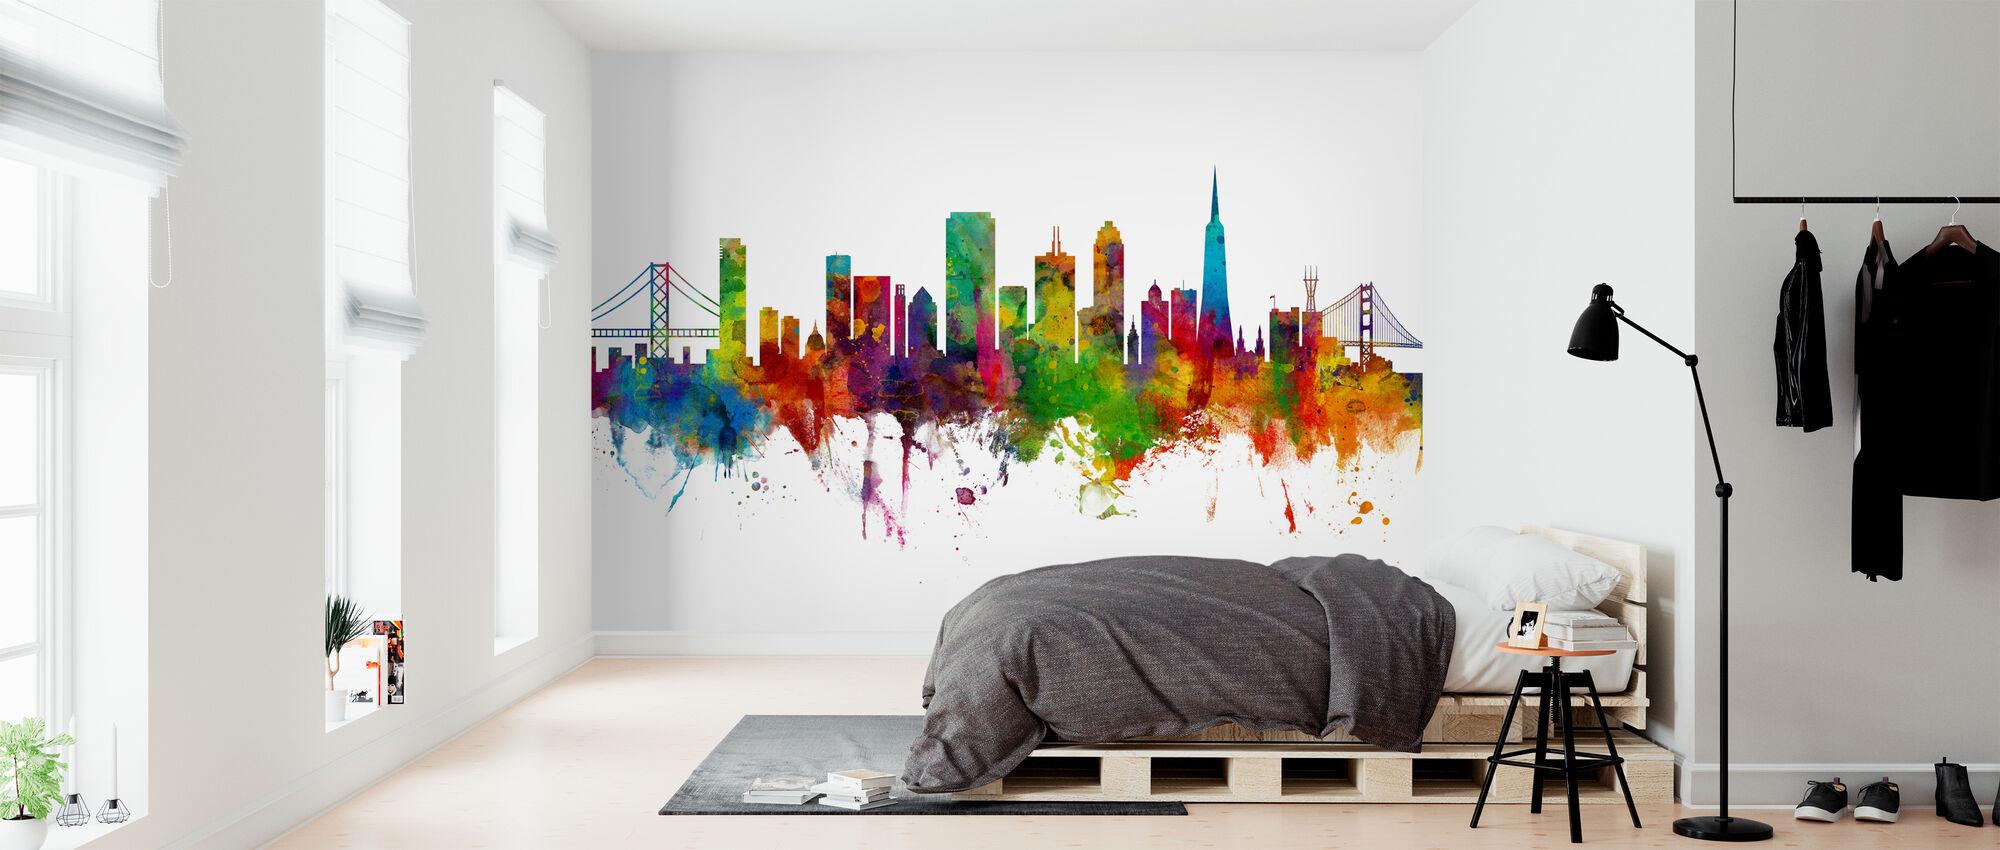 San Francisco City Skyline - Wallpaper - Bedroom